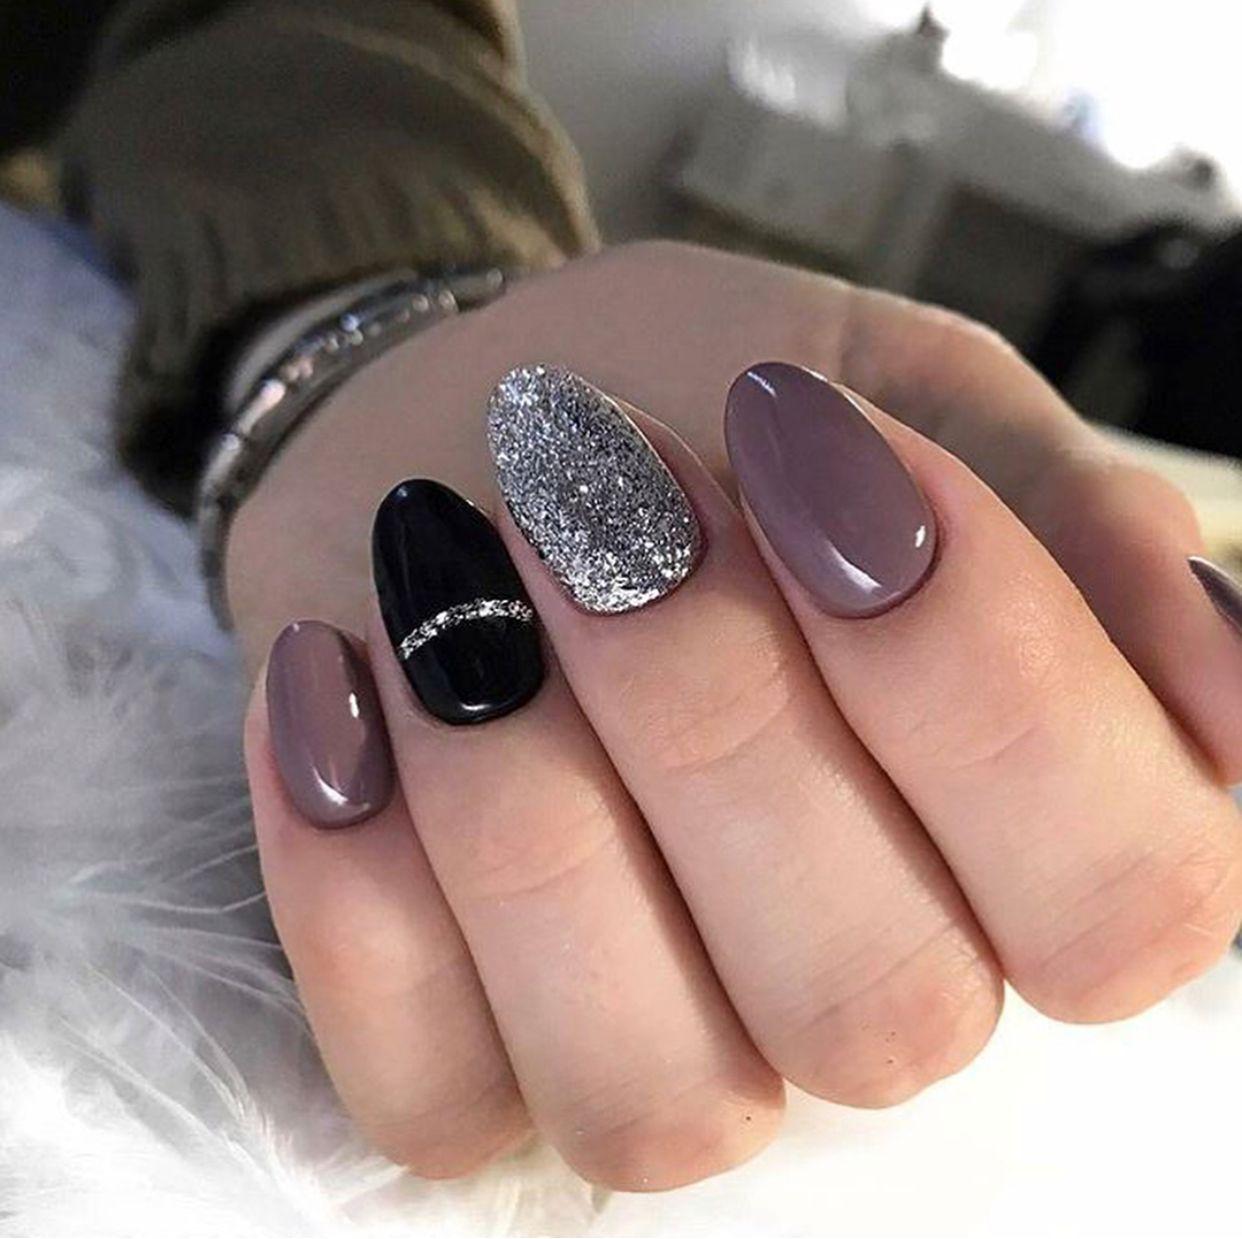 Pin de Aimee Ellis en Nail ideas | Pinterest | Diseños de uñas ...